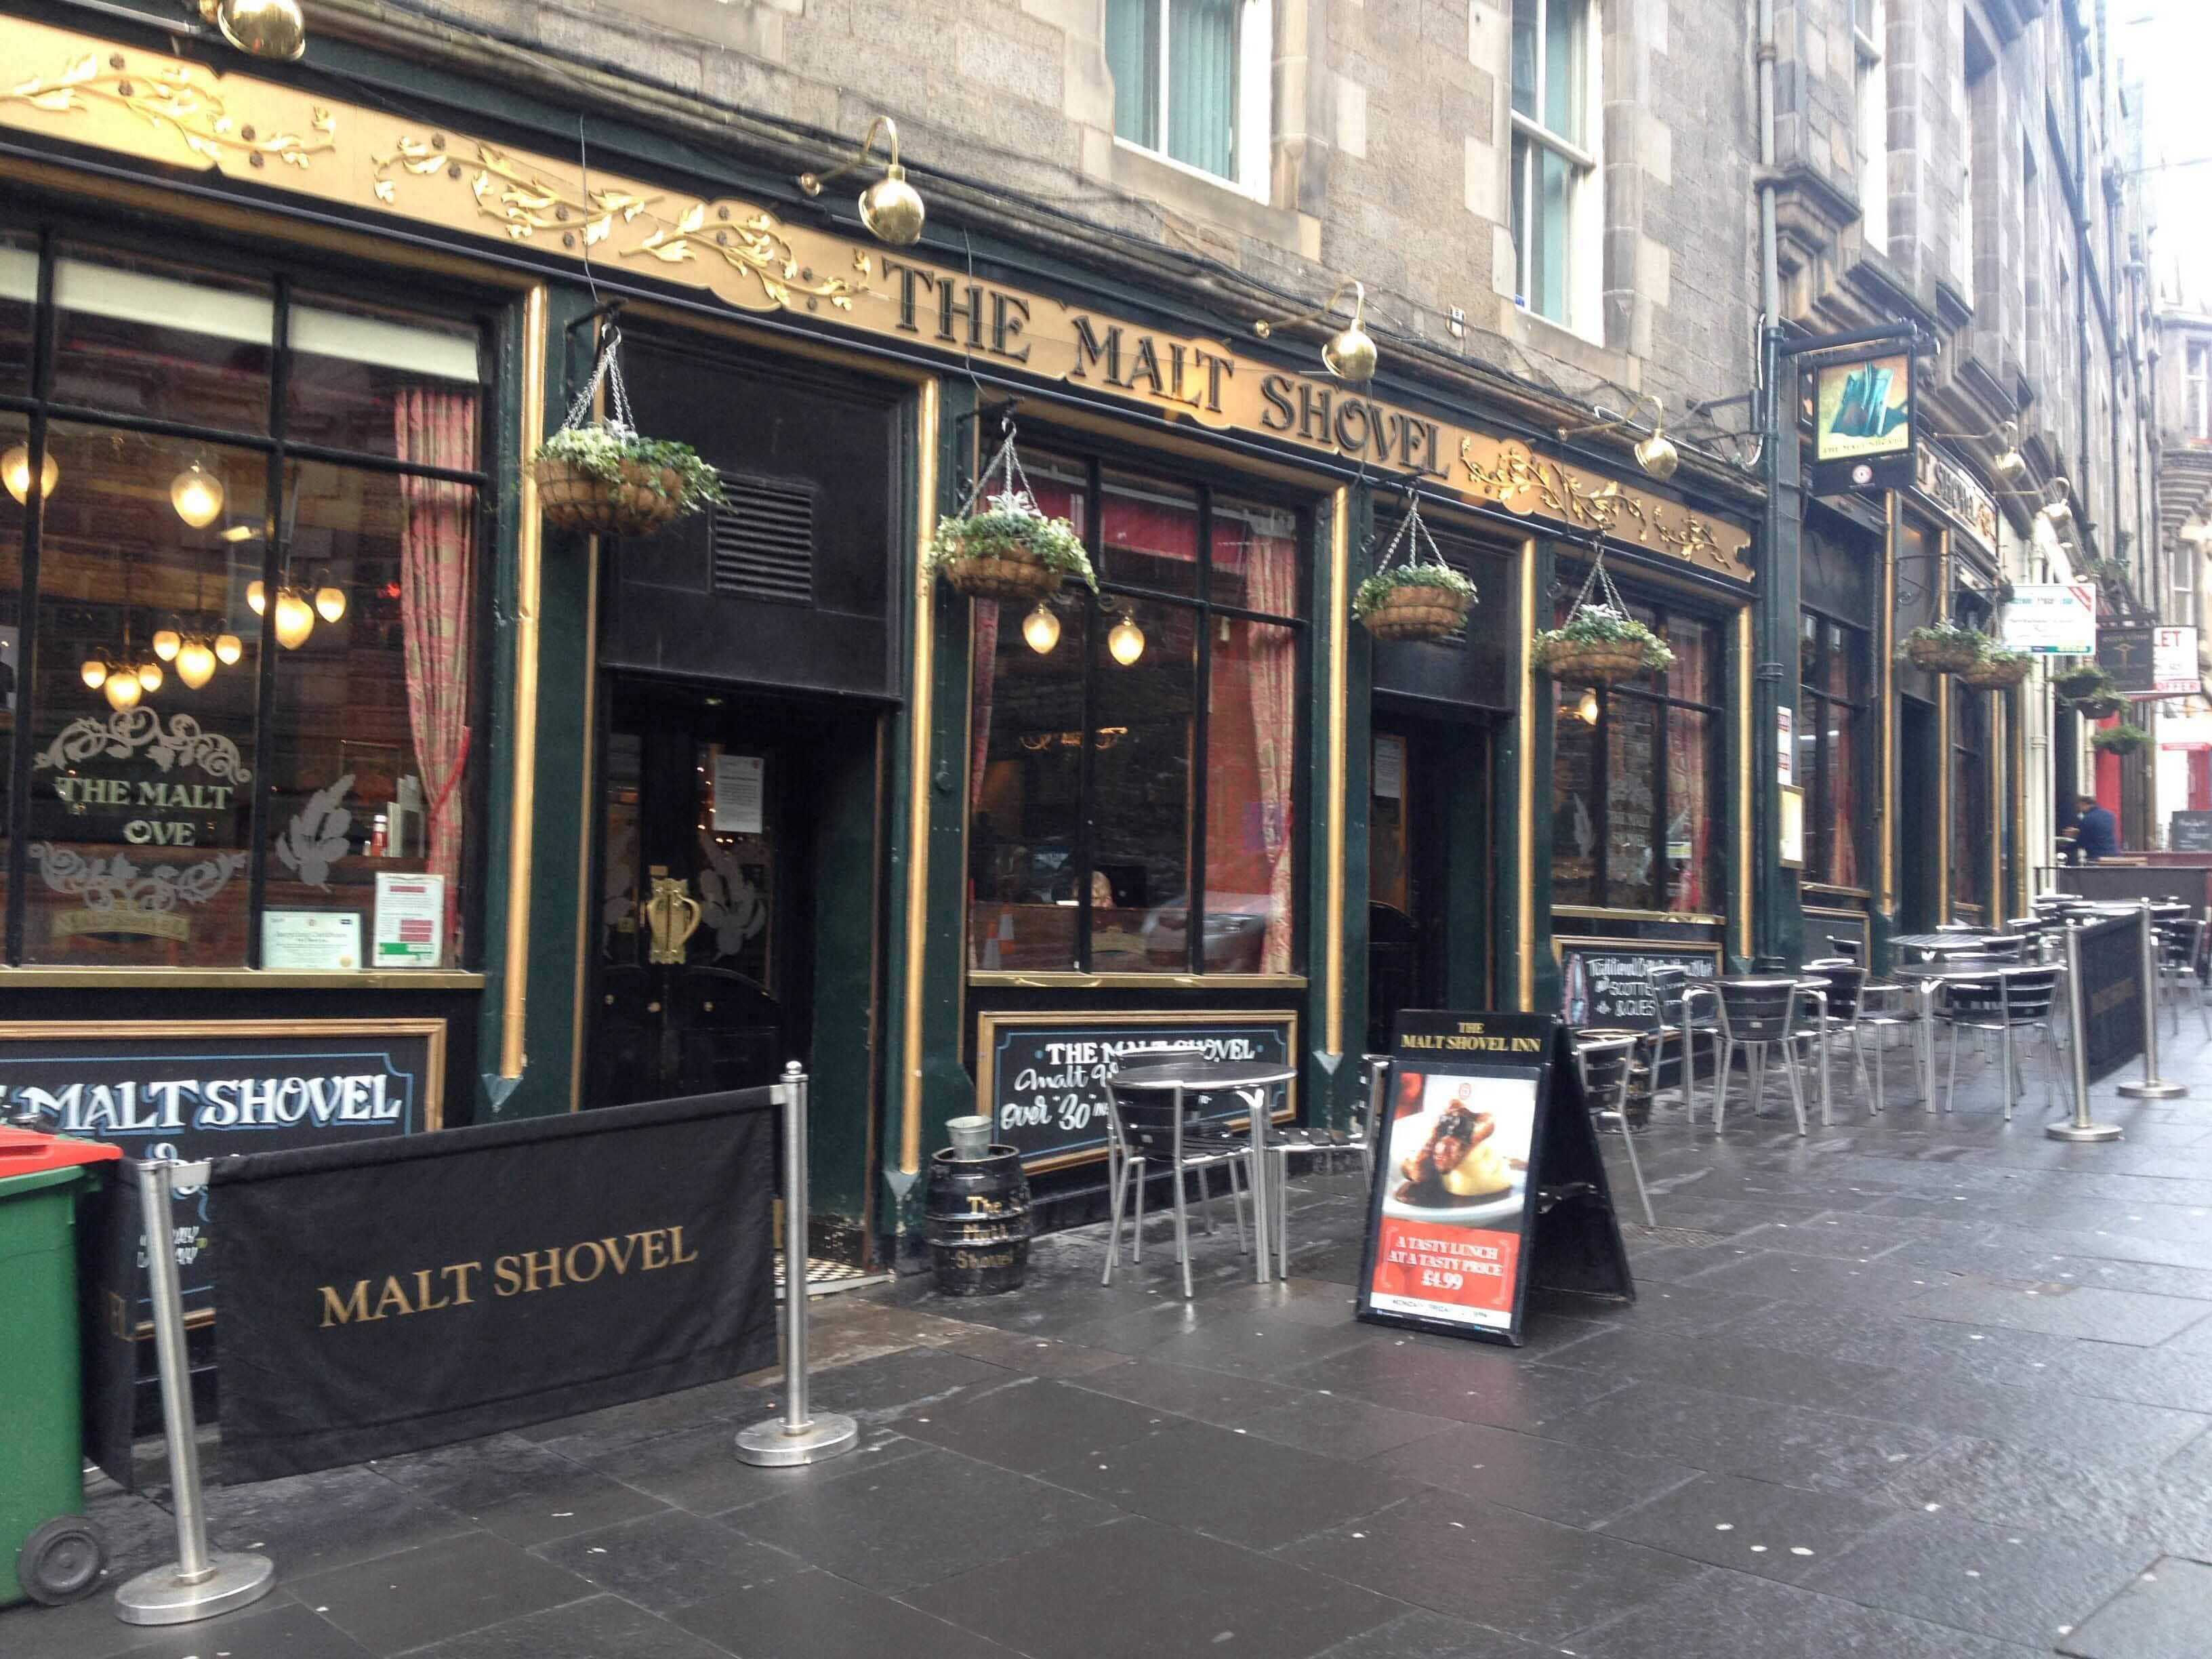 The Malt Shovel Taylor Walker Reviews User Reviews For The Malt Shovel Taylor Walker Cockburn Street Old Town Edinburgh